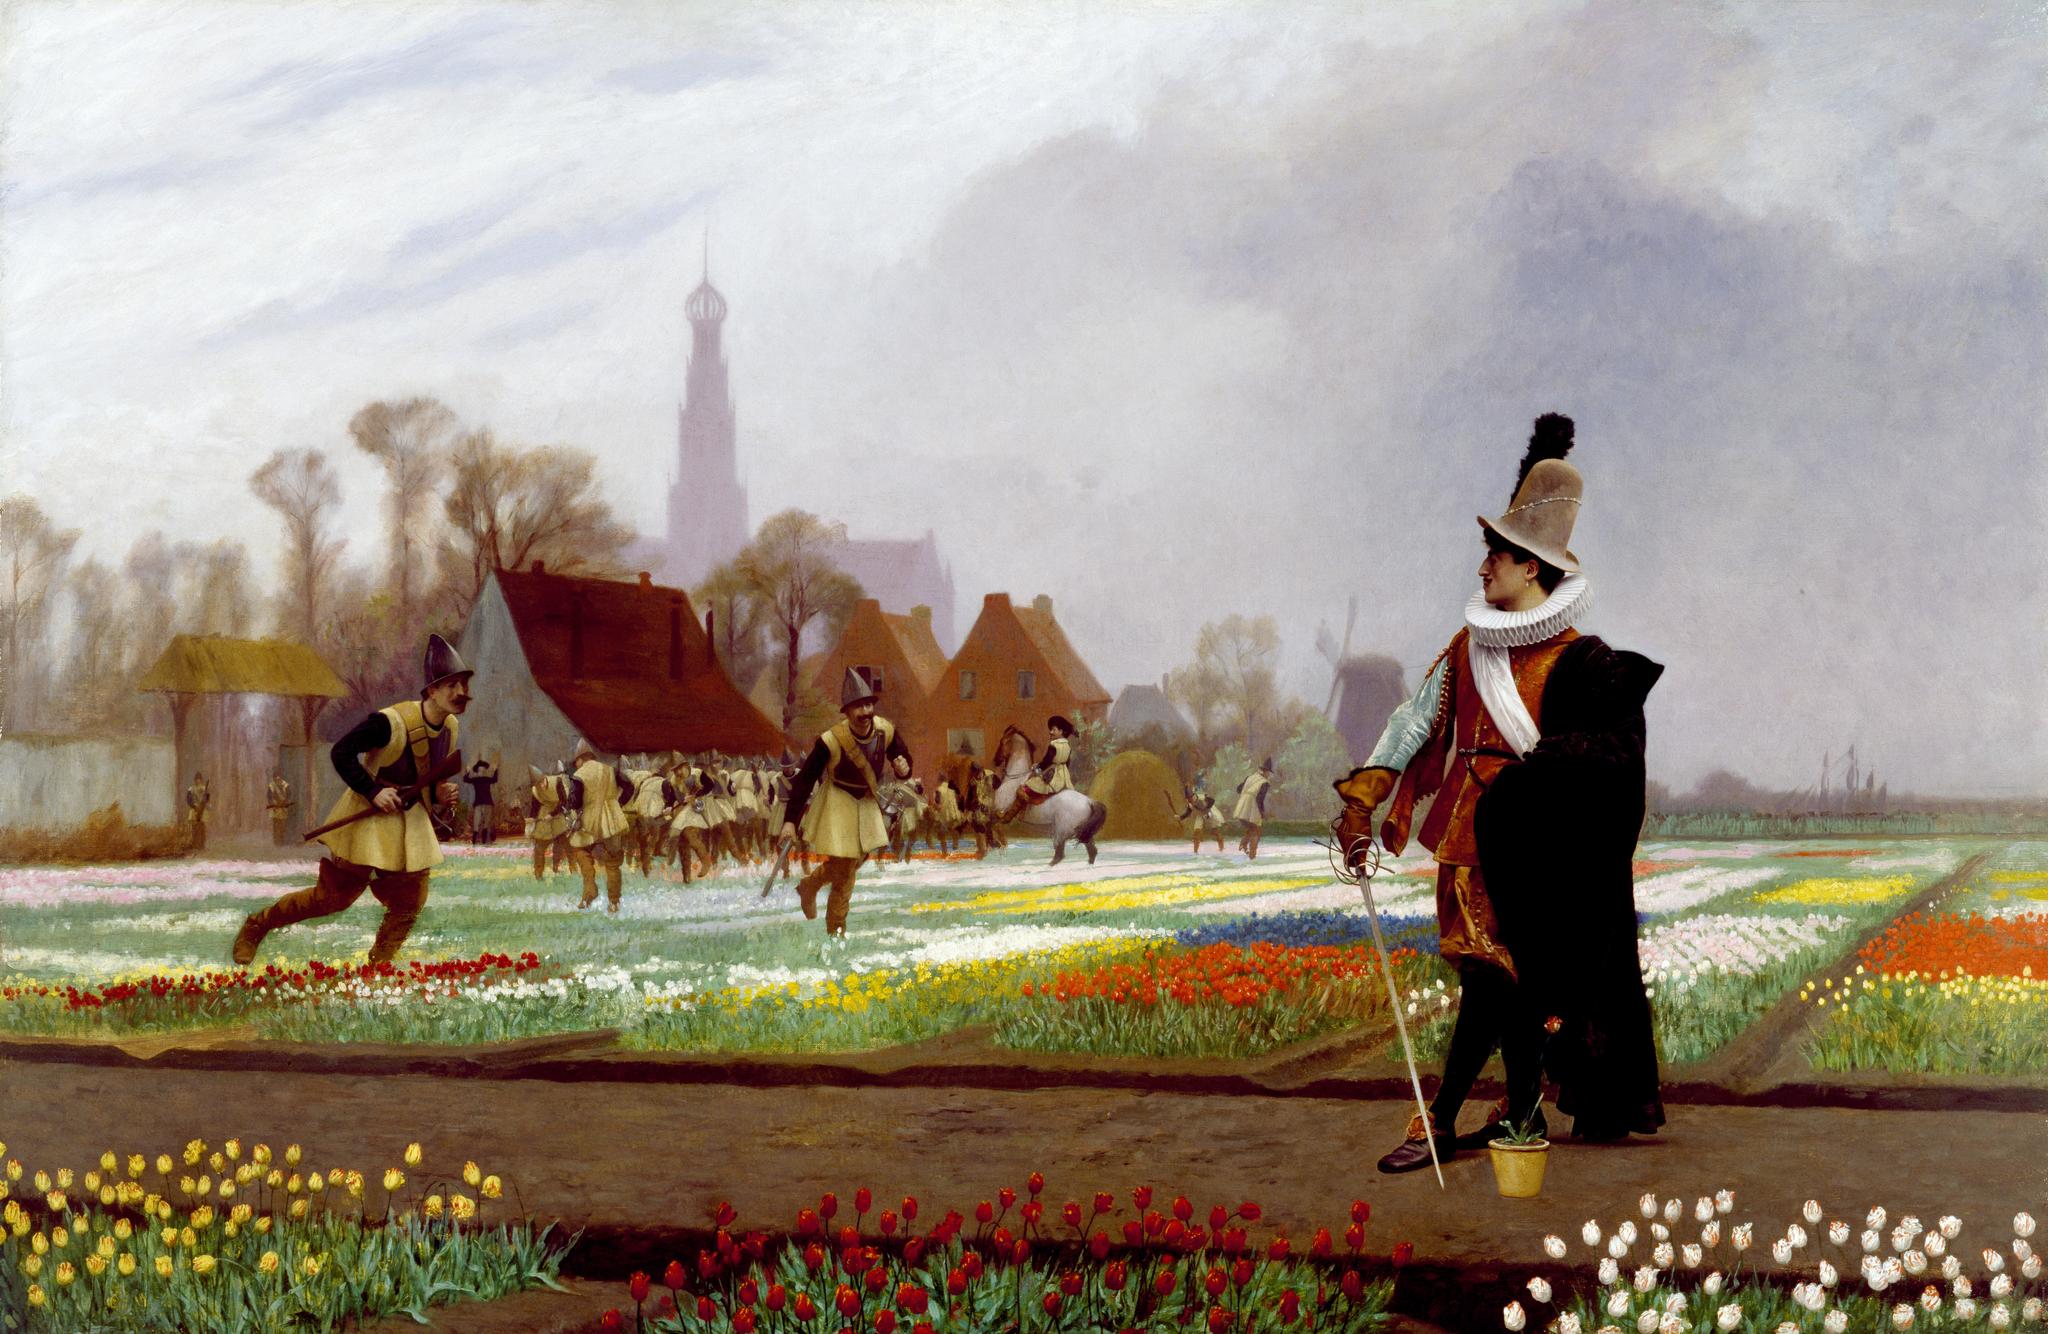 2048px-Jean-Léon_Gérôme_-_The_Tulip_Folly_-_Lossless.png